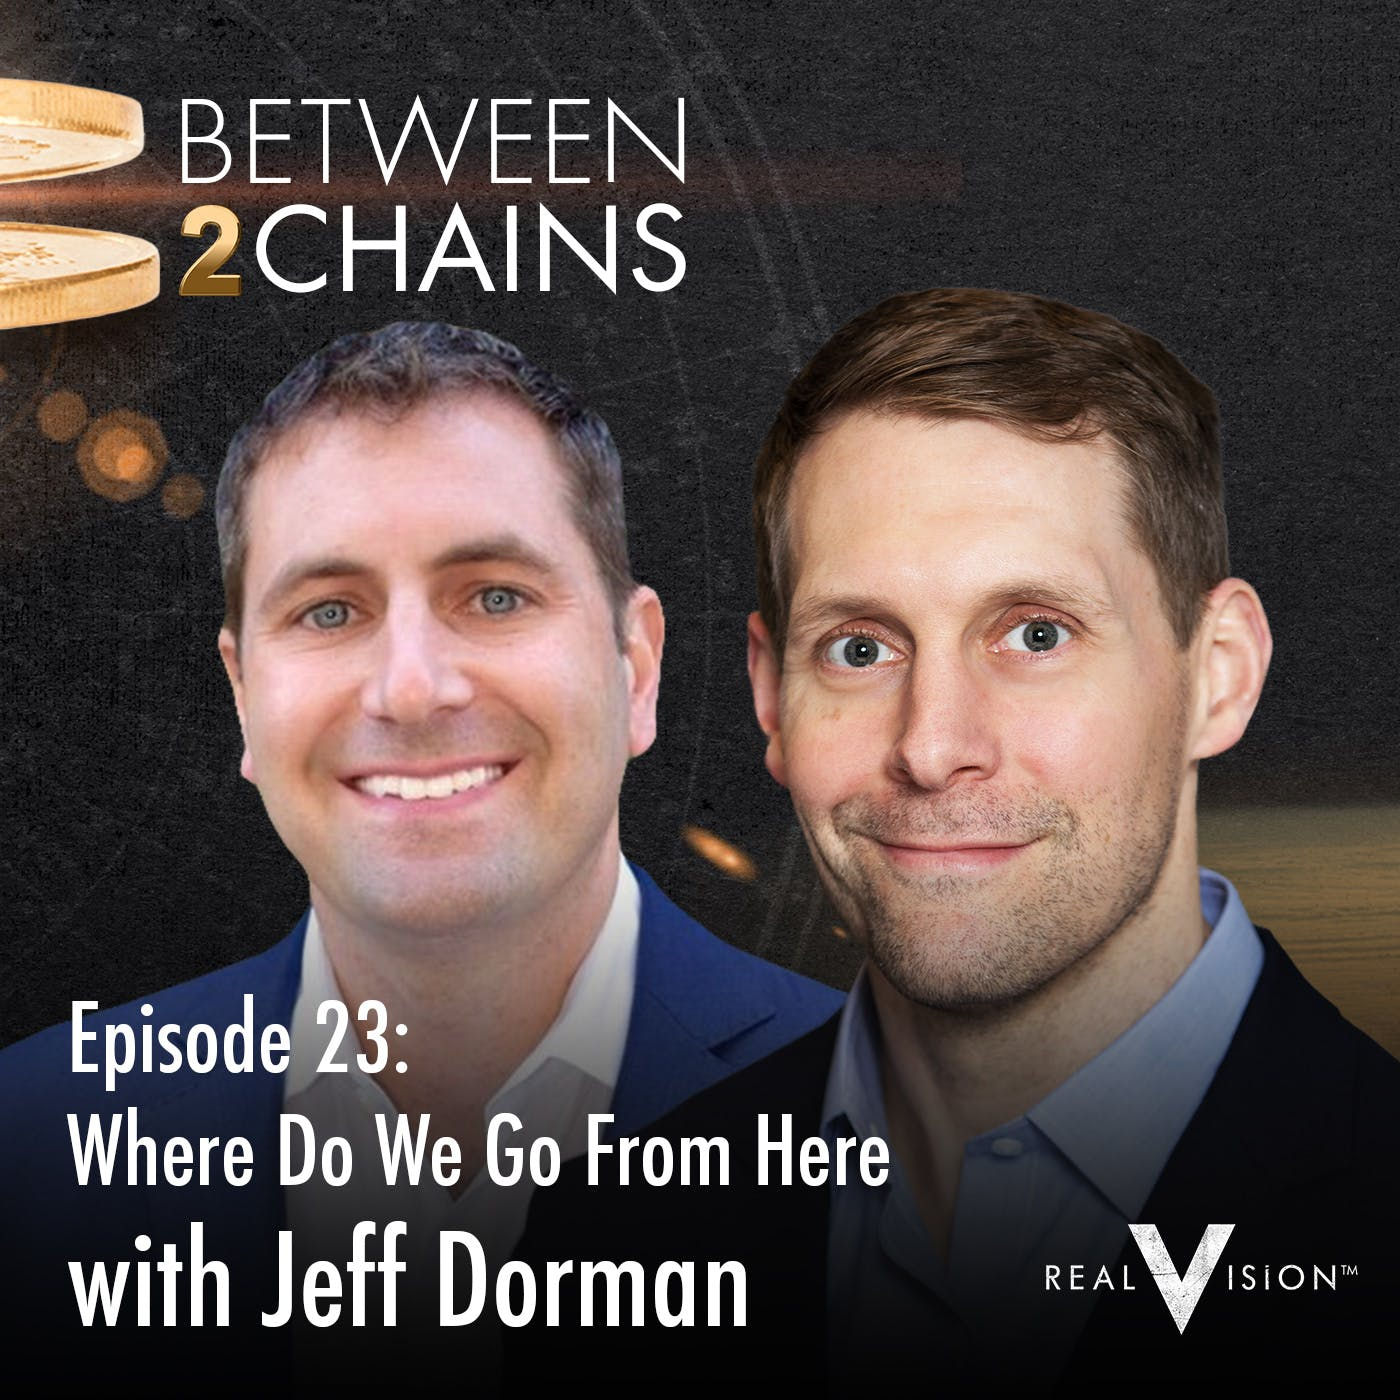 B2C023: Where Do We Go From Here (w/ Jeff Dorman )